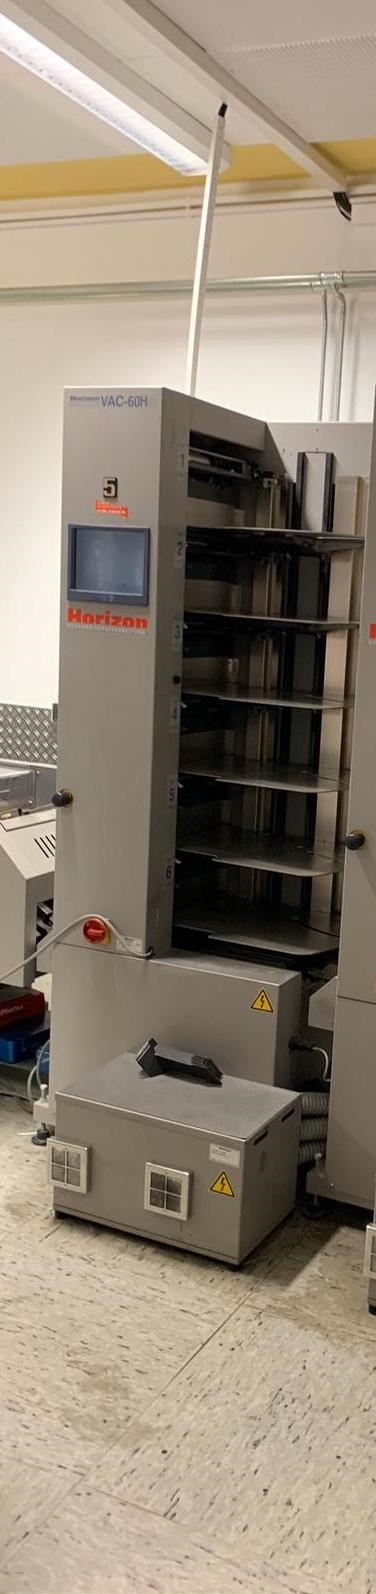 Horizon VAC-60Ha